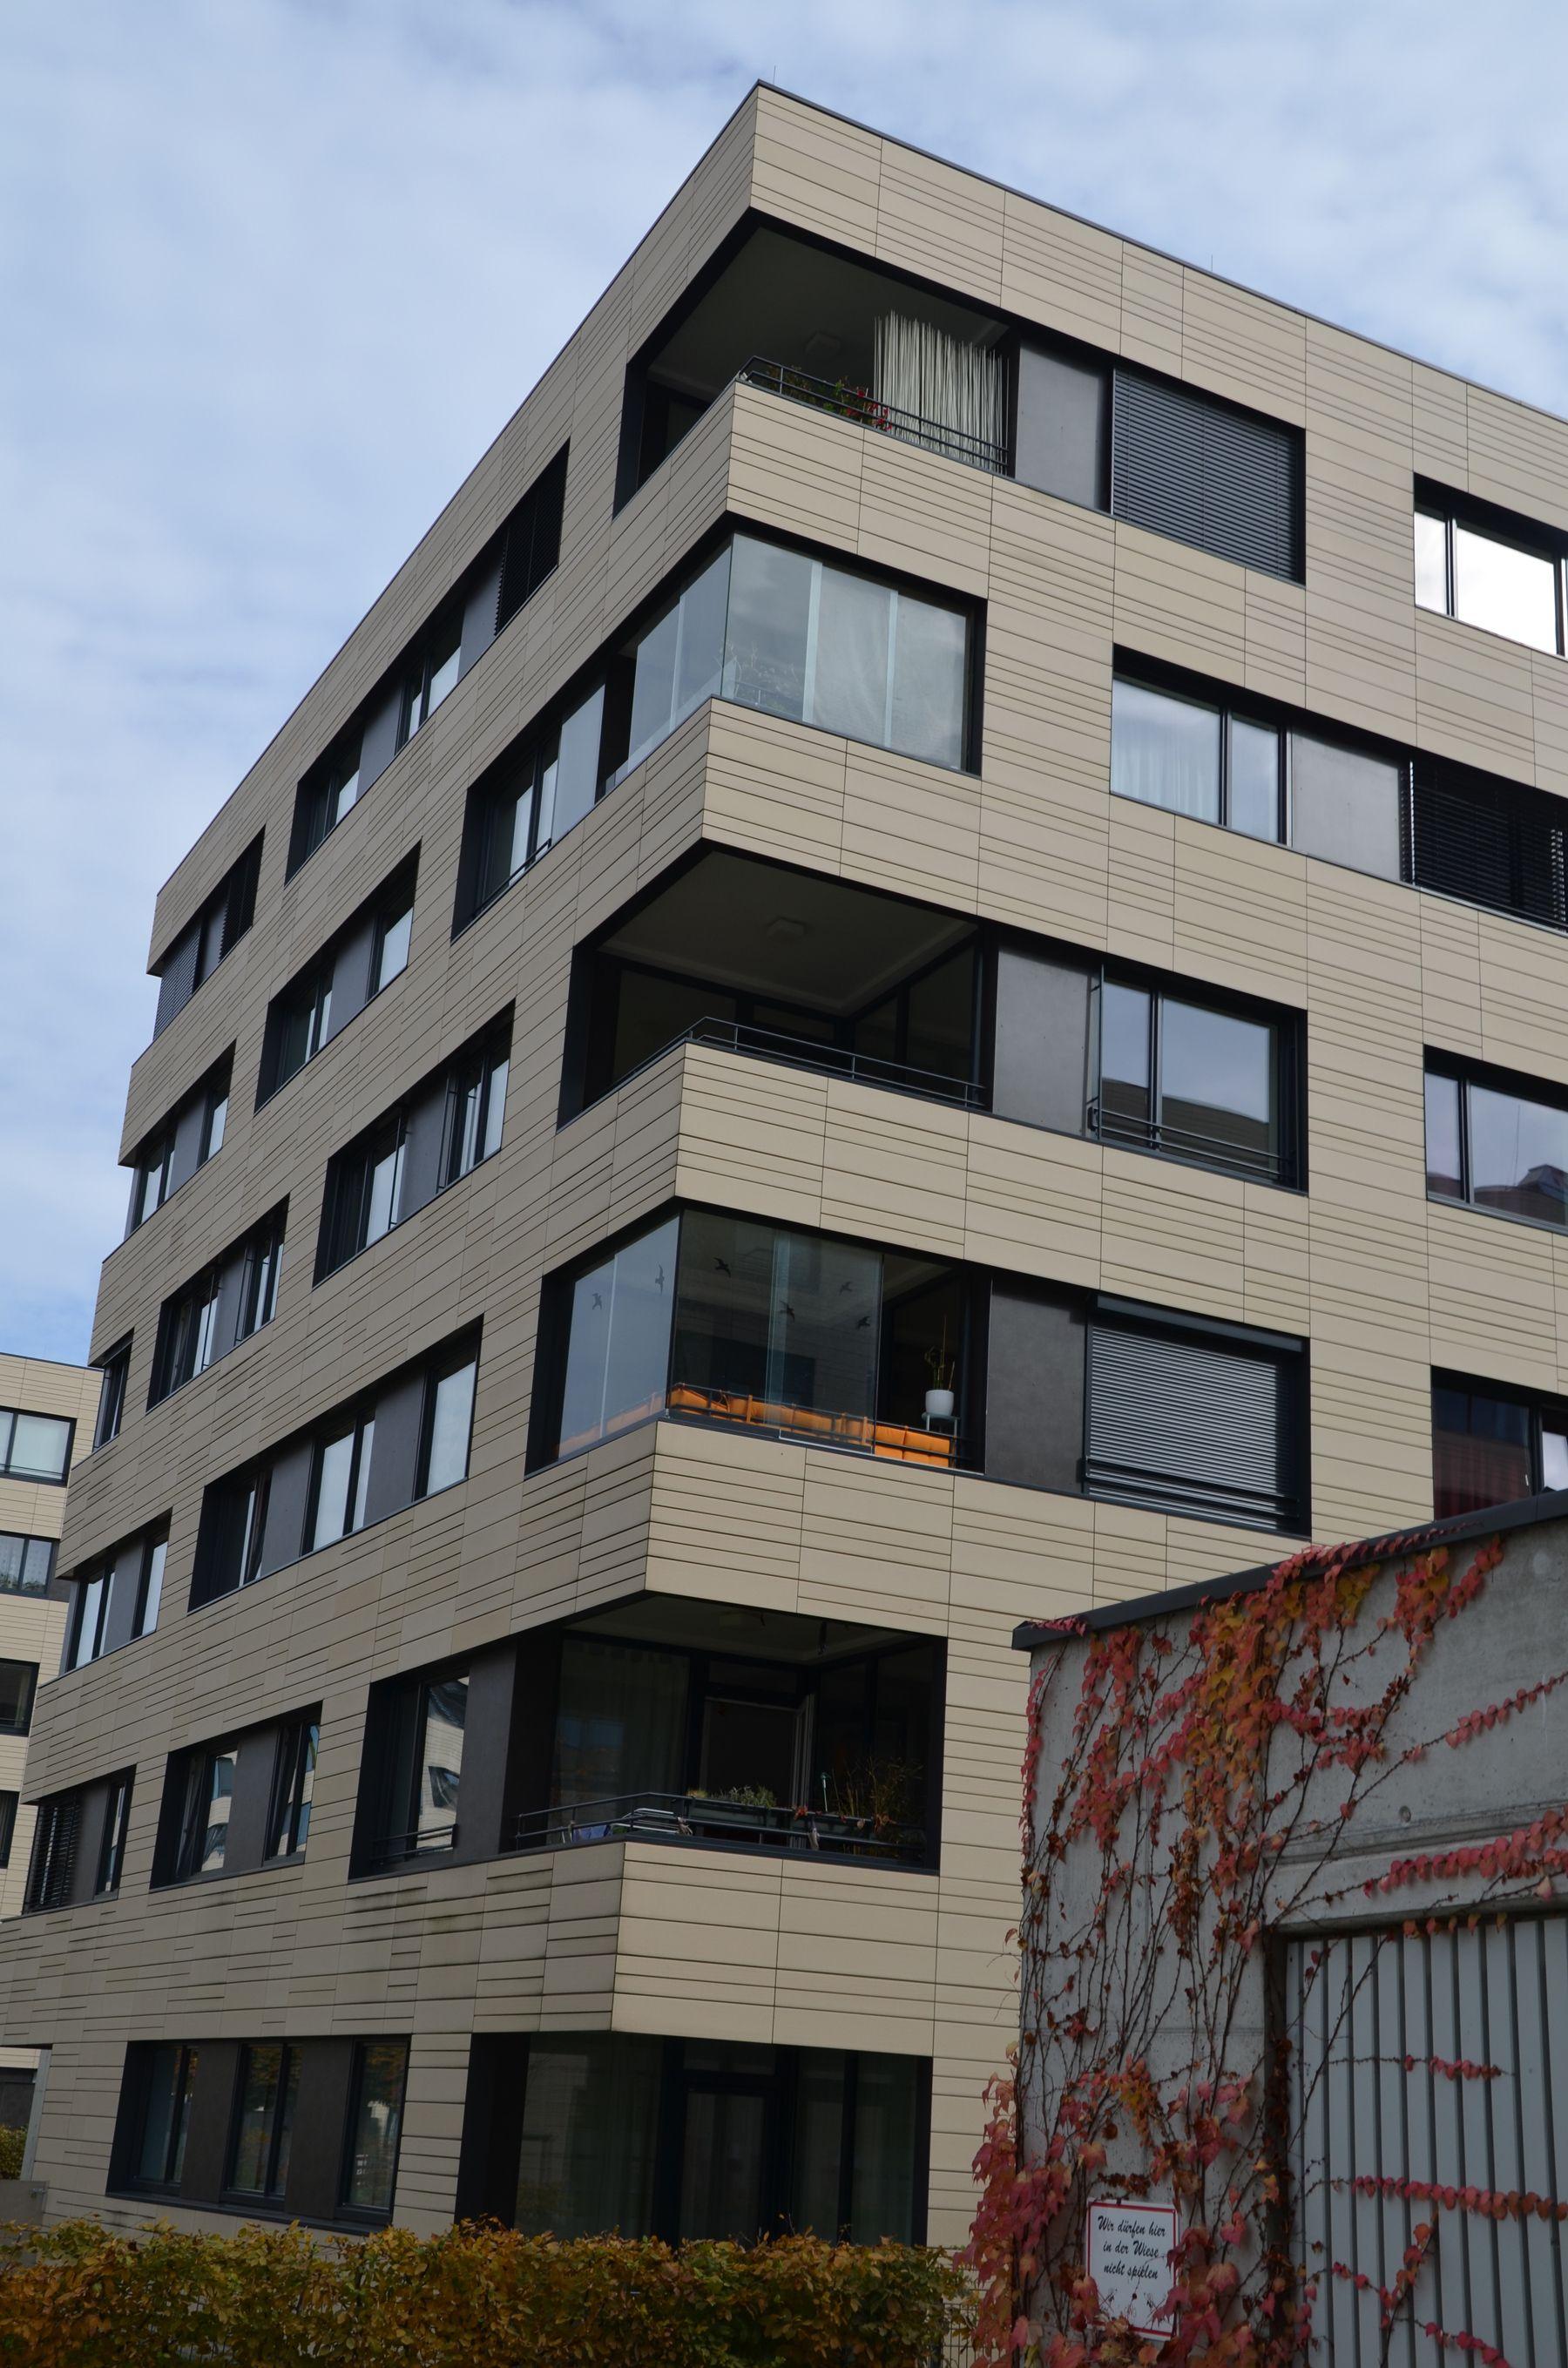 Rahmenlose Verglasung Fur Balkon In Der Lederergasse In Linz Ideen